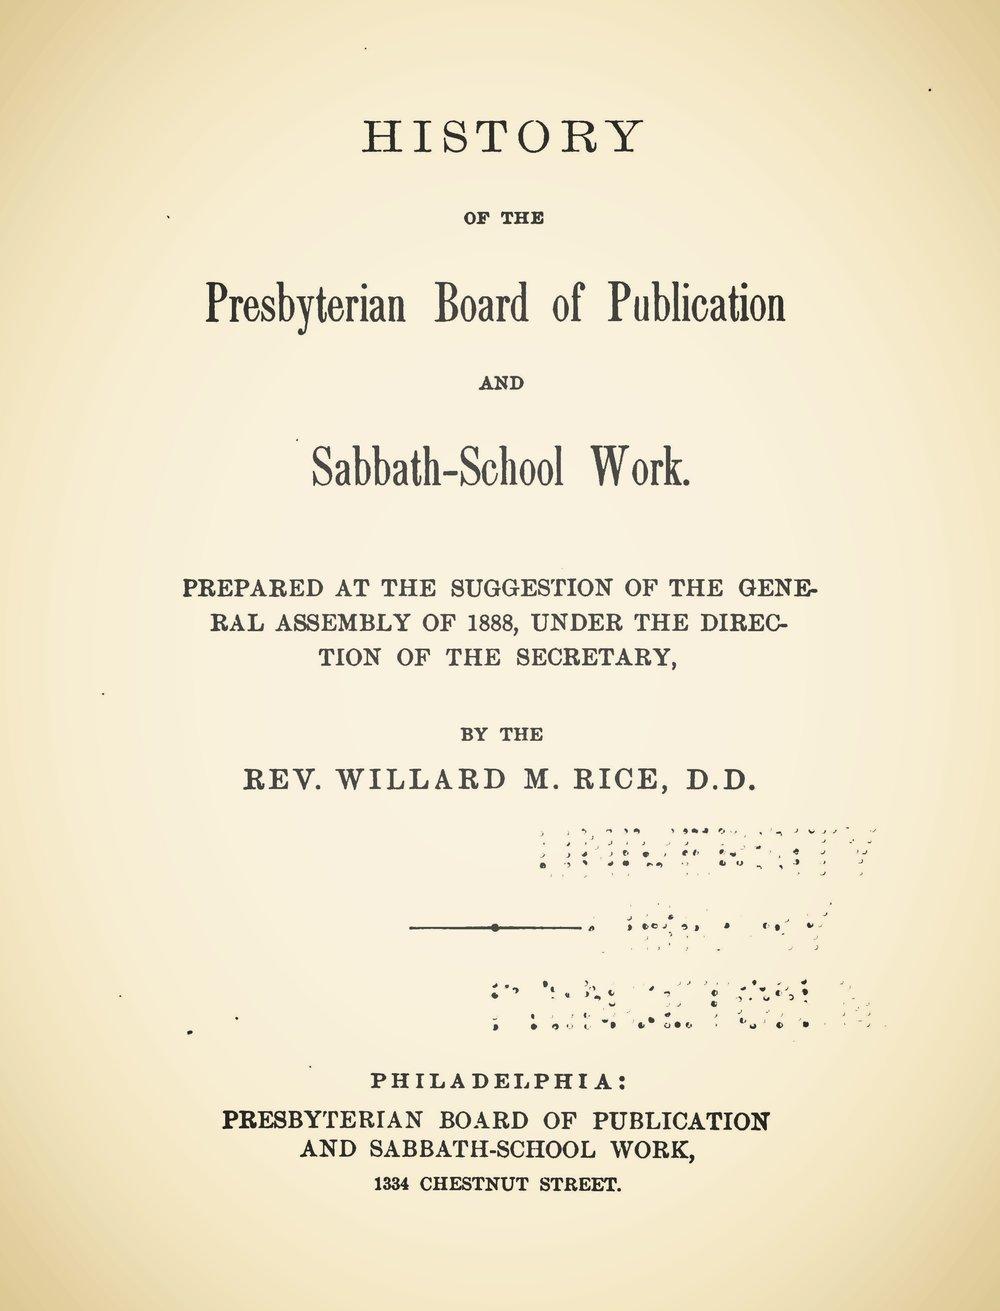 Rice, Willard Martin, History of the Presbyterian Board of Publication and Sabbath-School Work Title Page.jpg